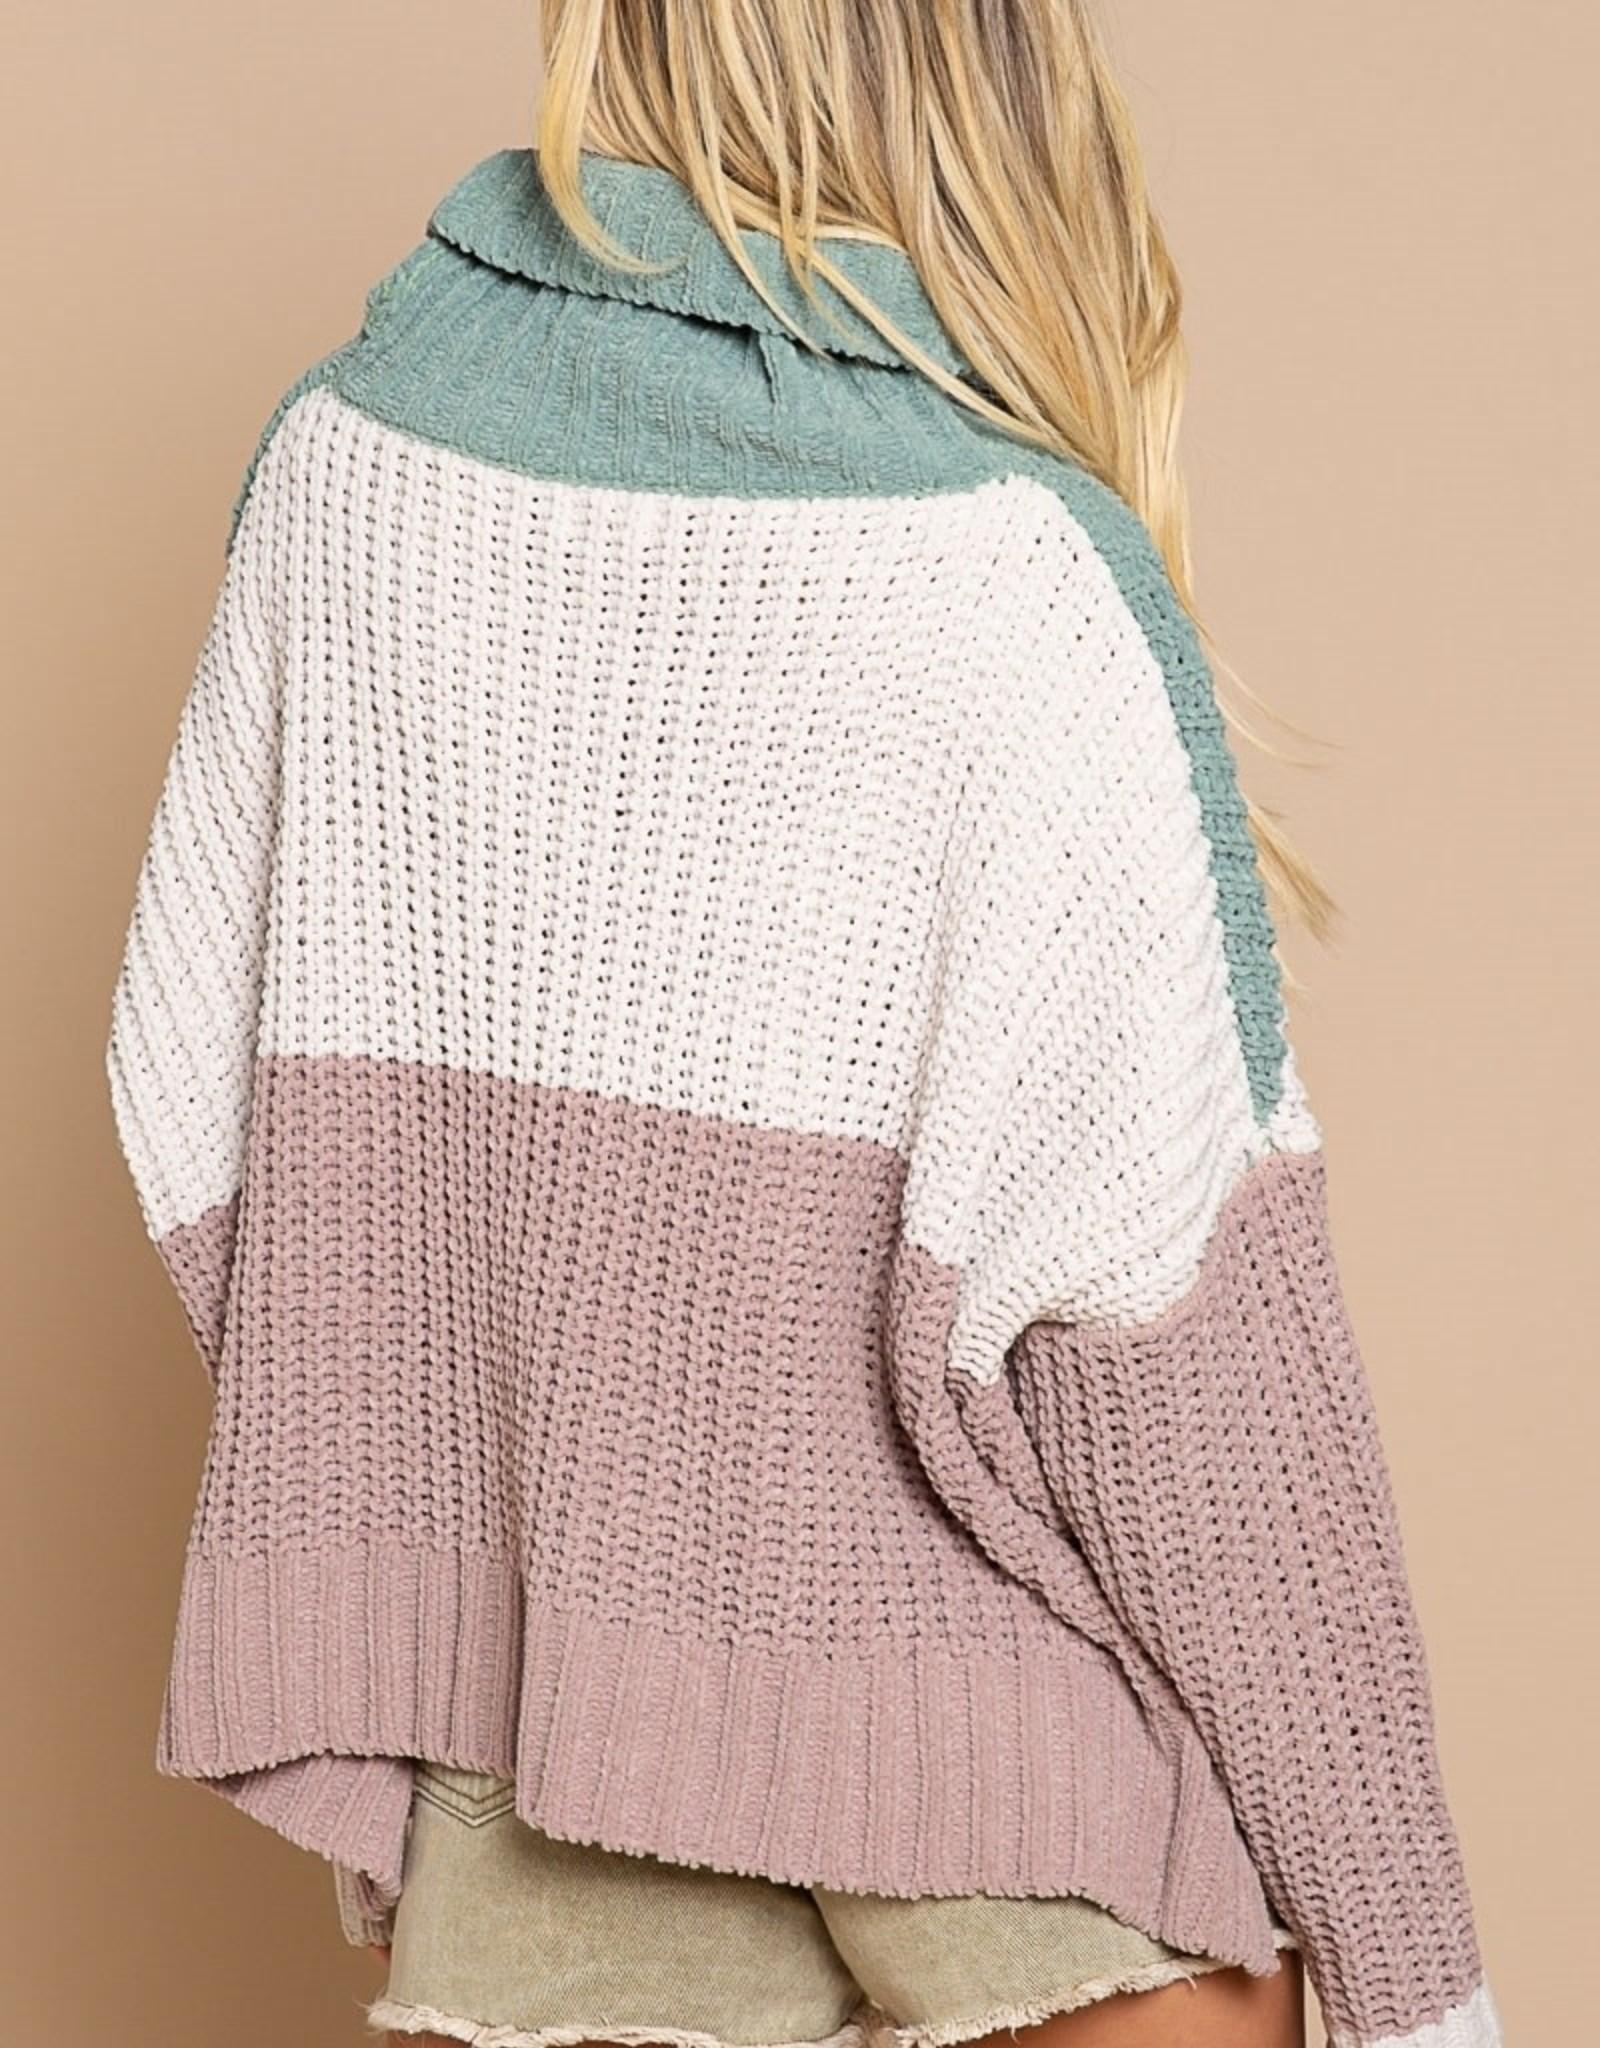 POL Clothing Chenille Colorblock Turtleneck